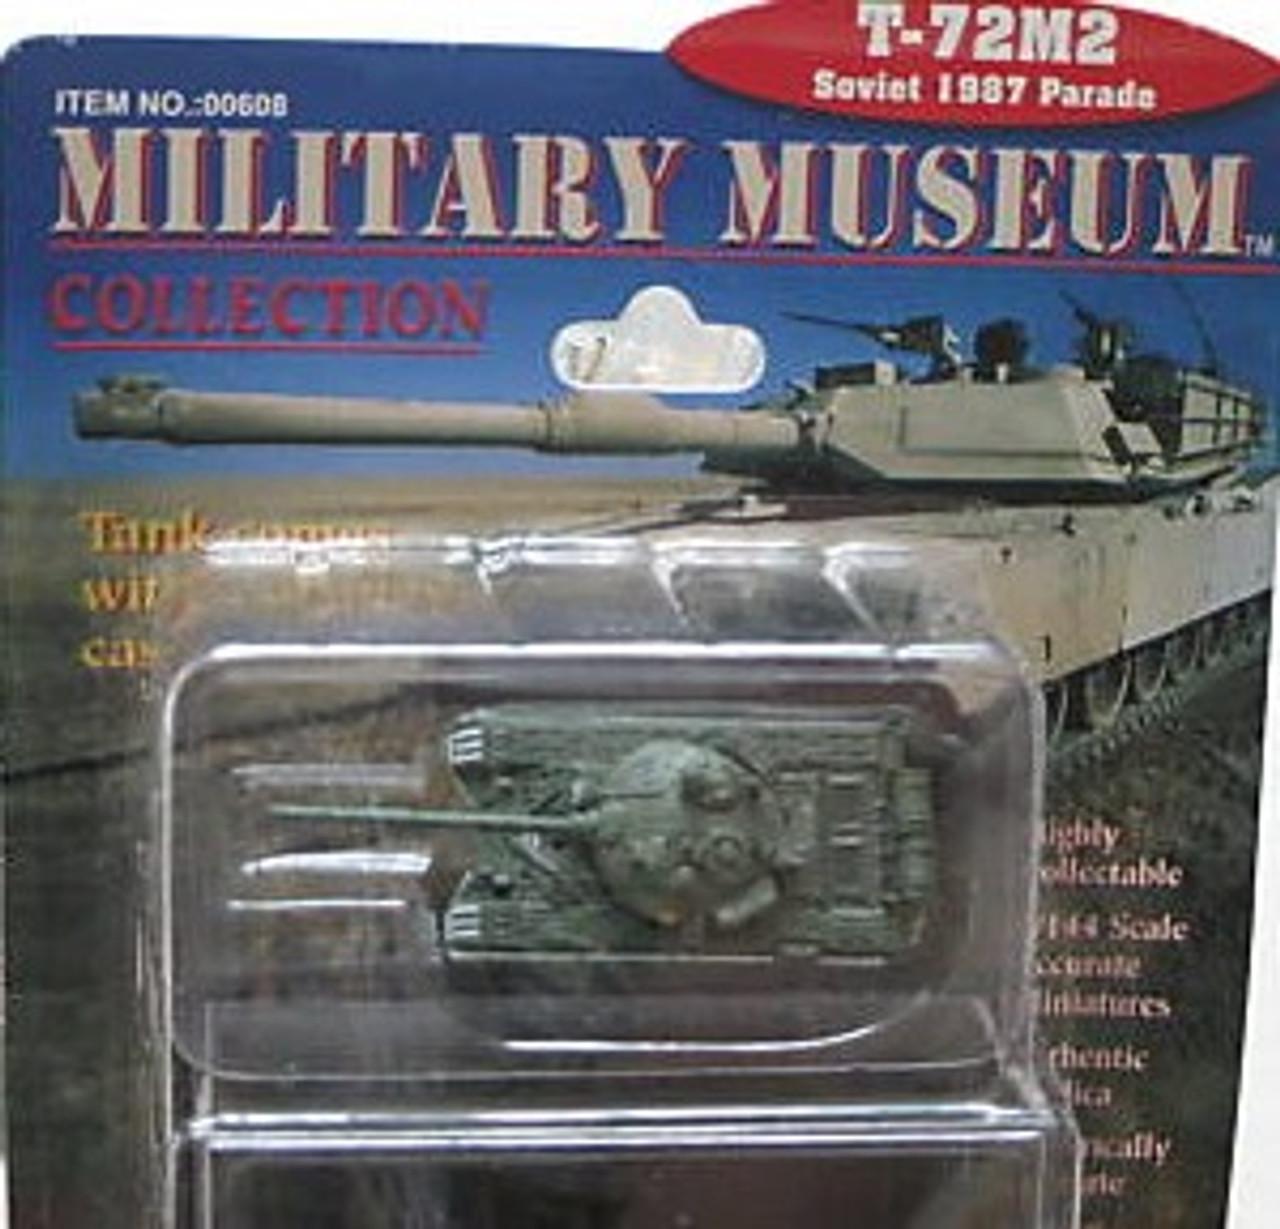 PGH-608  1/144 T72M2 1987 Parade Soviet Tank (Assembled)